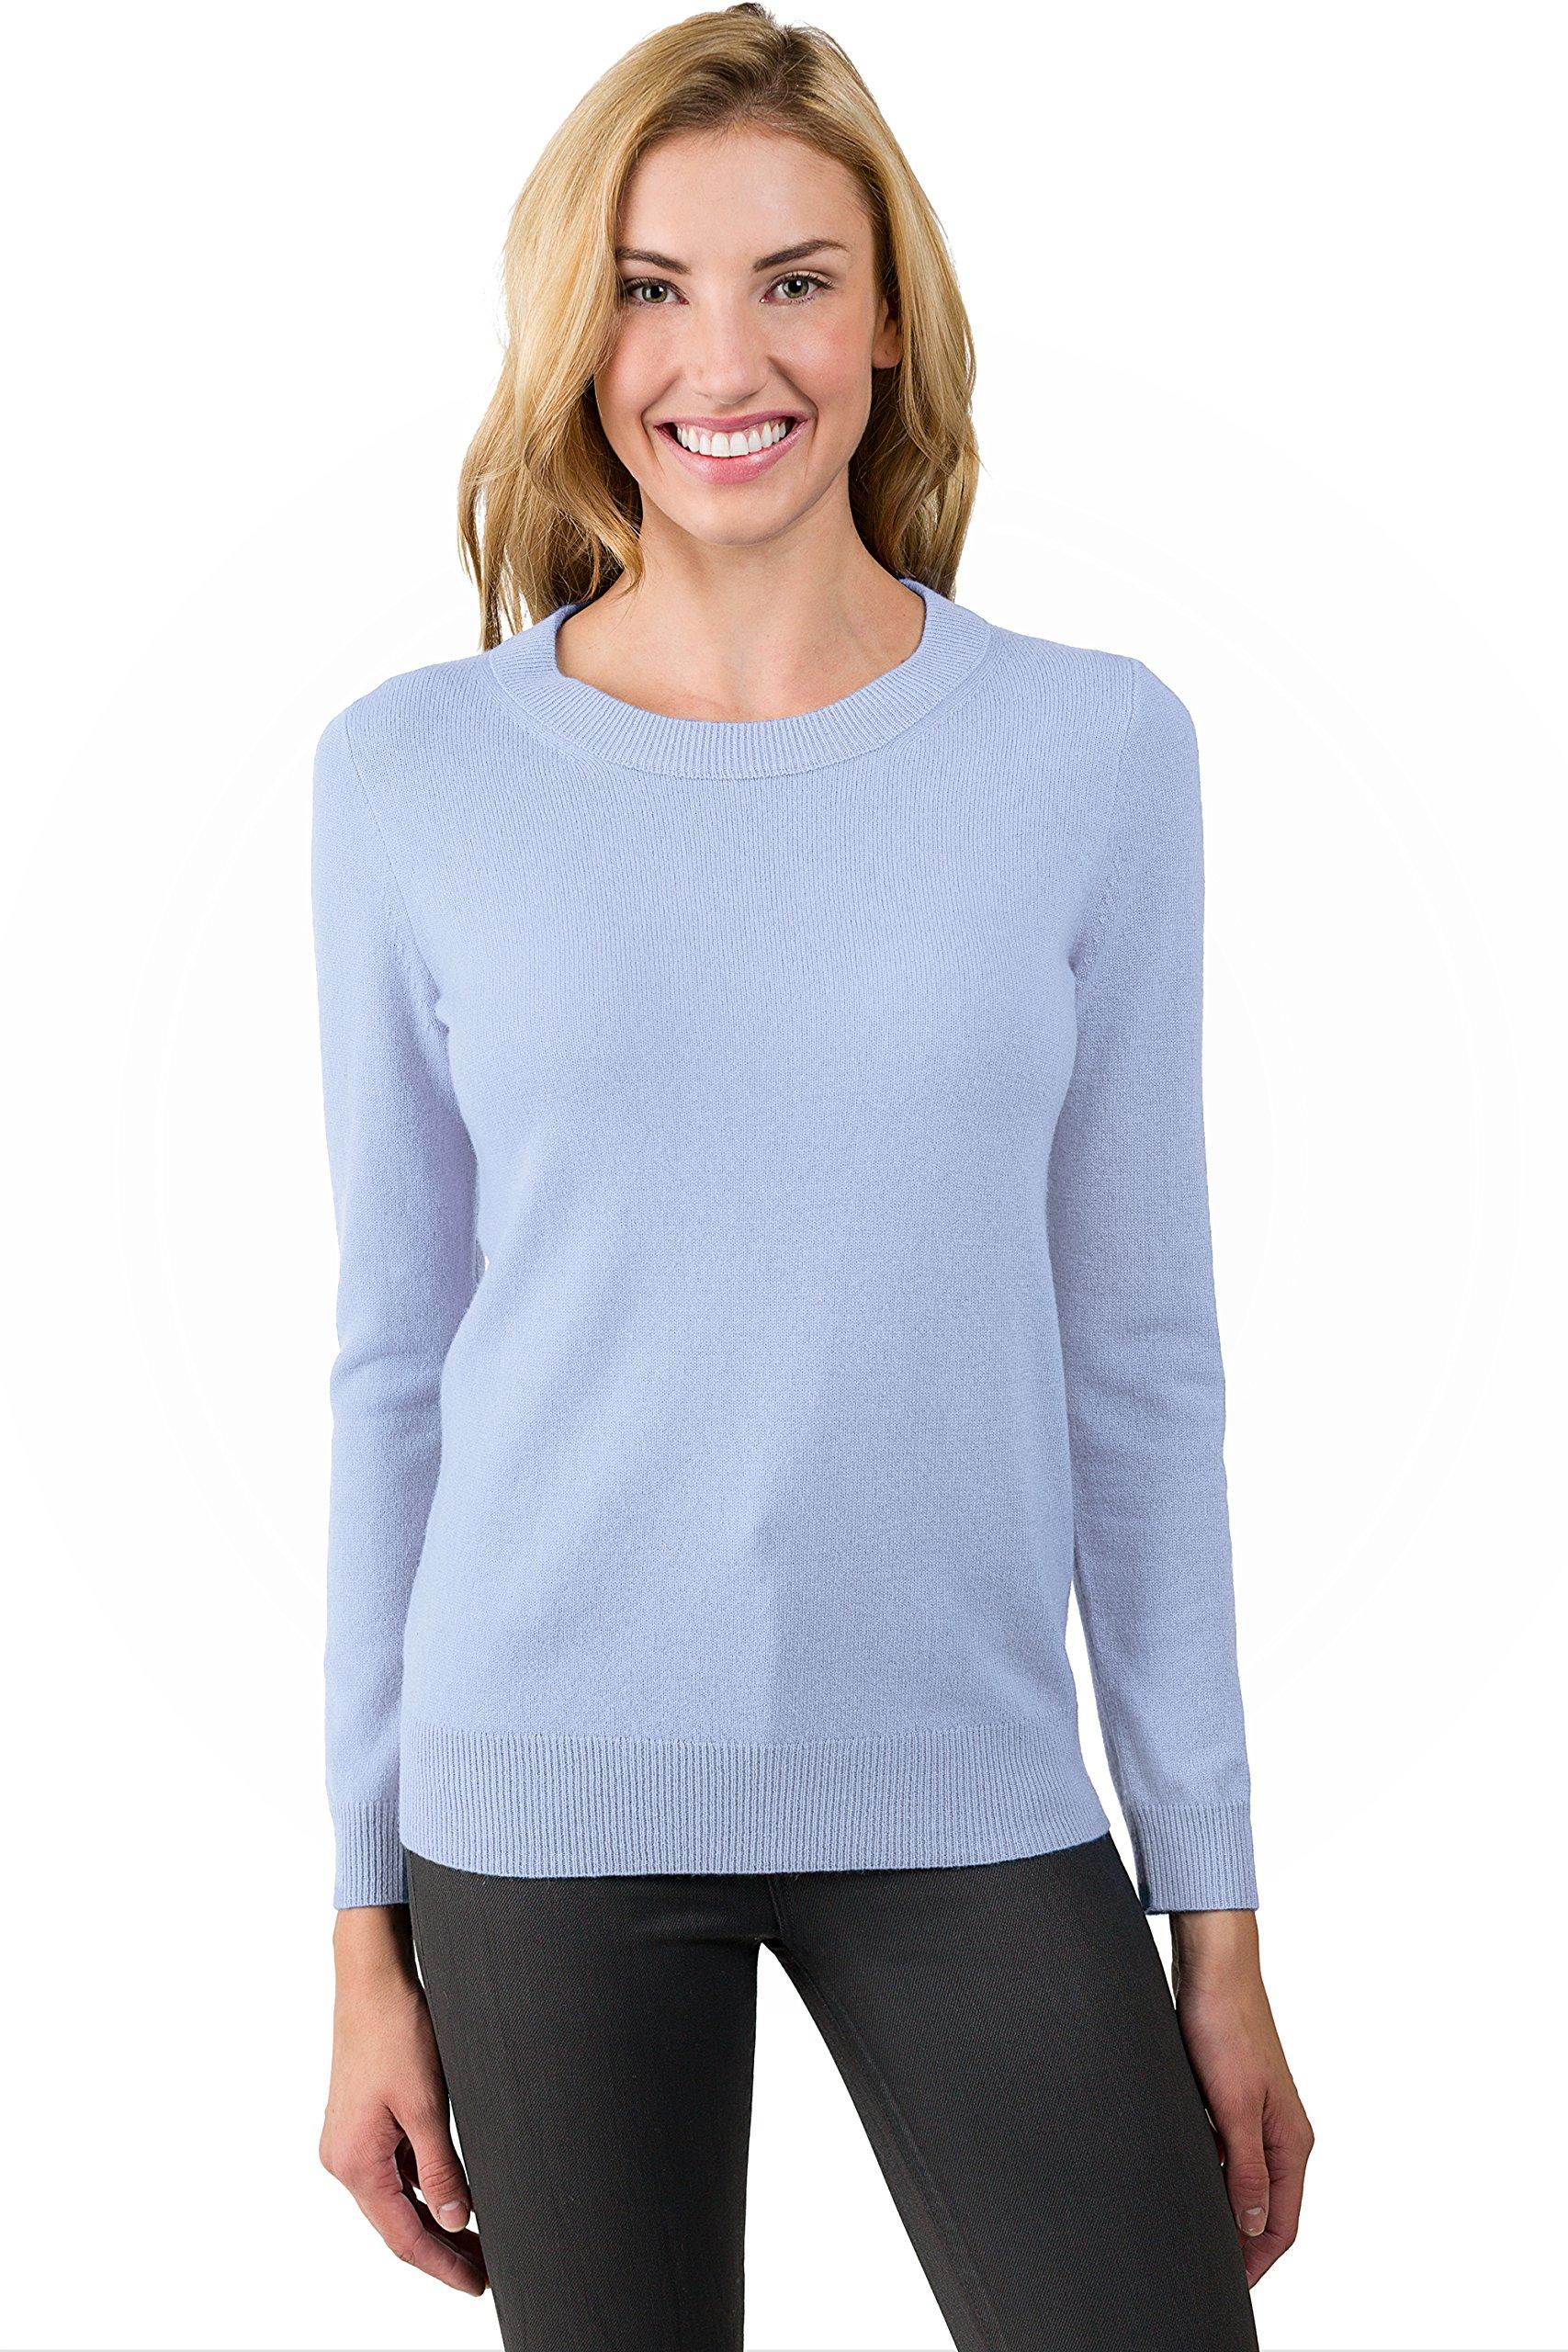 JENNIE LIU Women's 100% Pure Cashmere Long Sleeve Crew Neck Sweater (M, Sky)